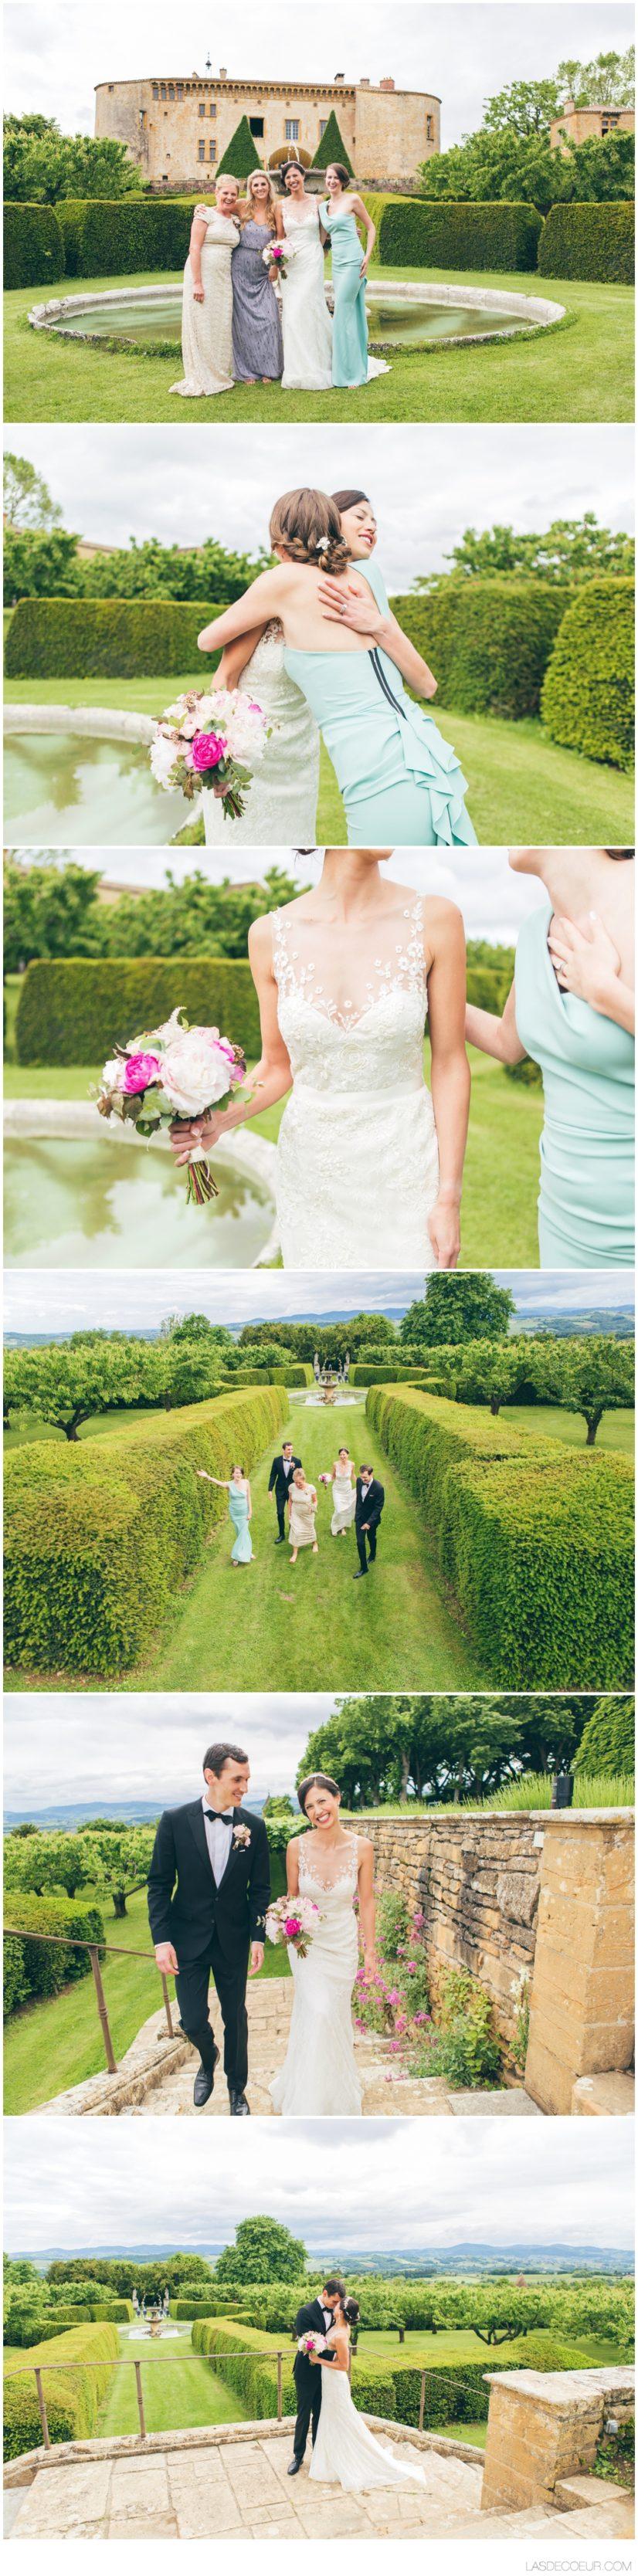 Photographe et vidéaste mariage Lyon ©lasdecoeur